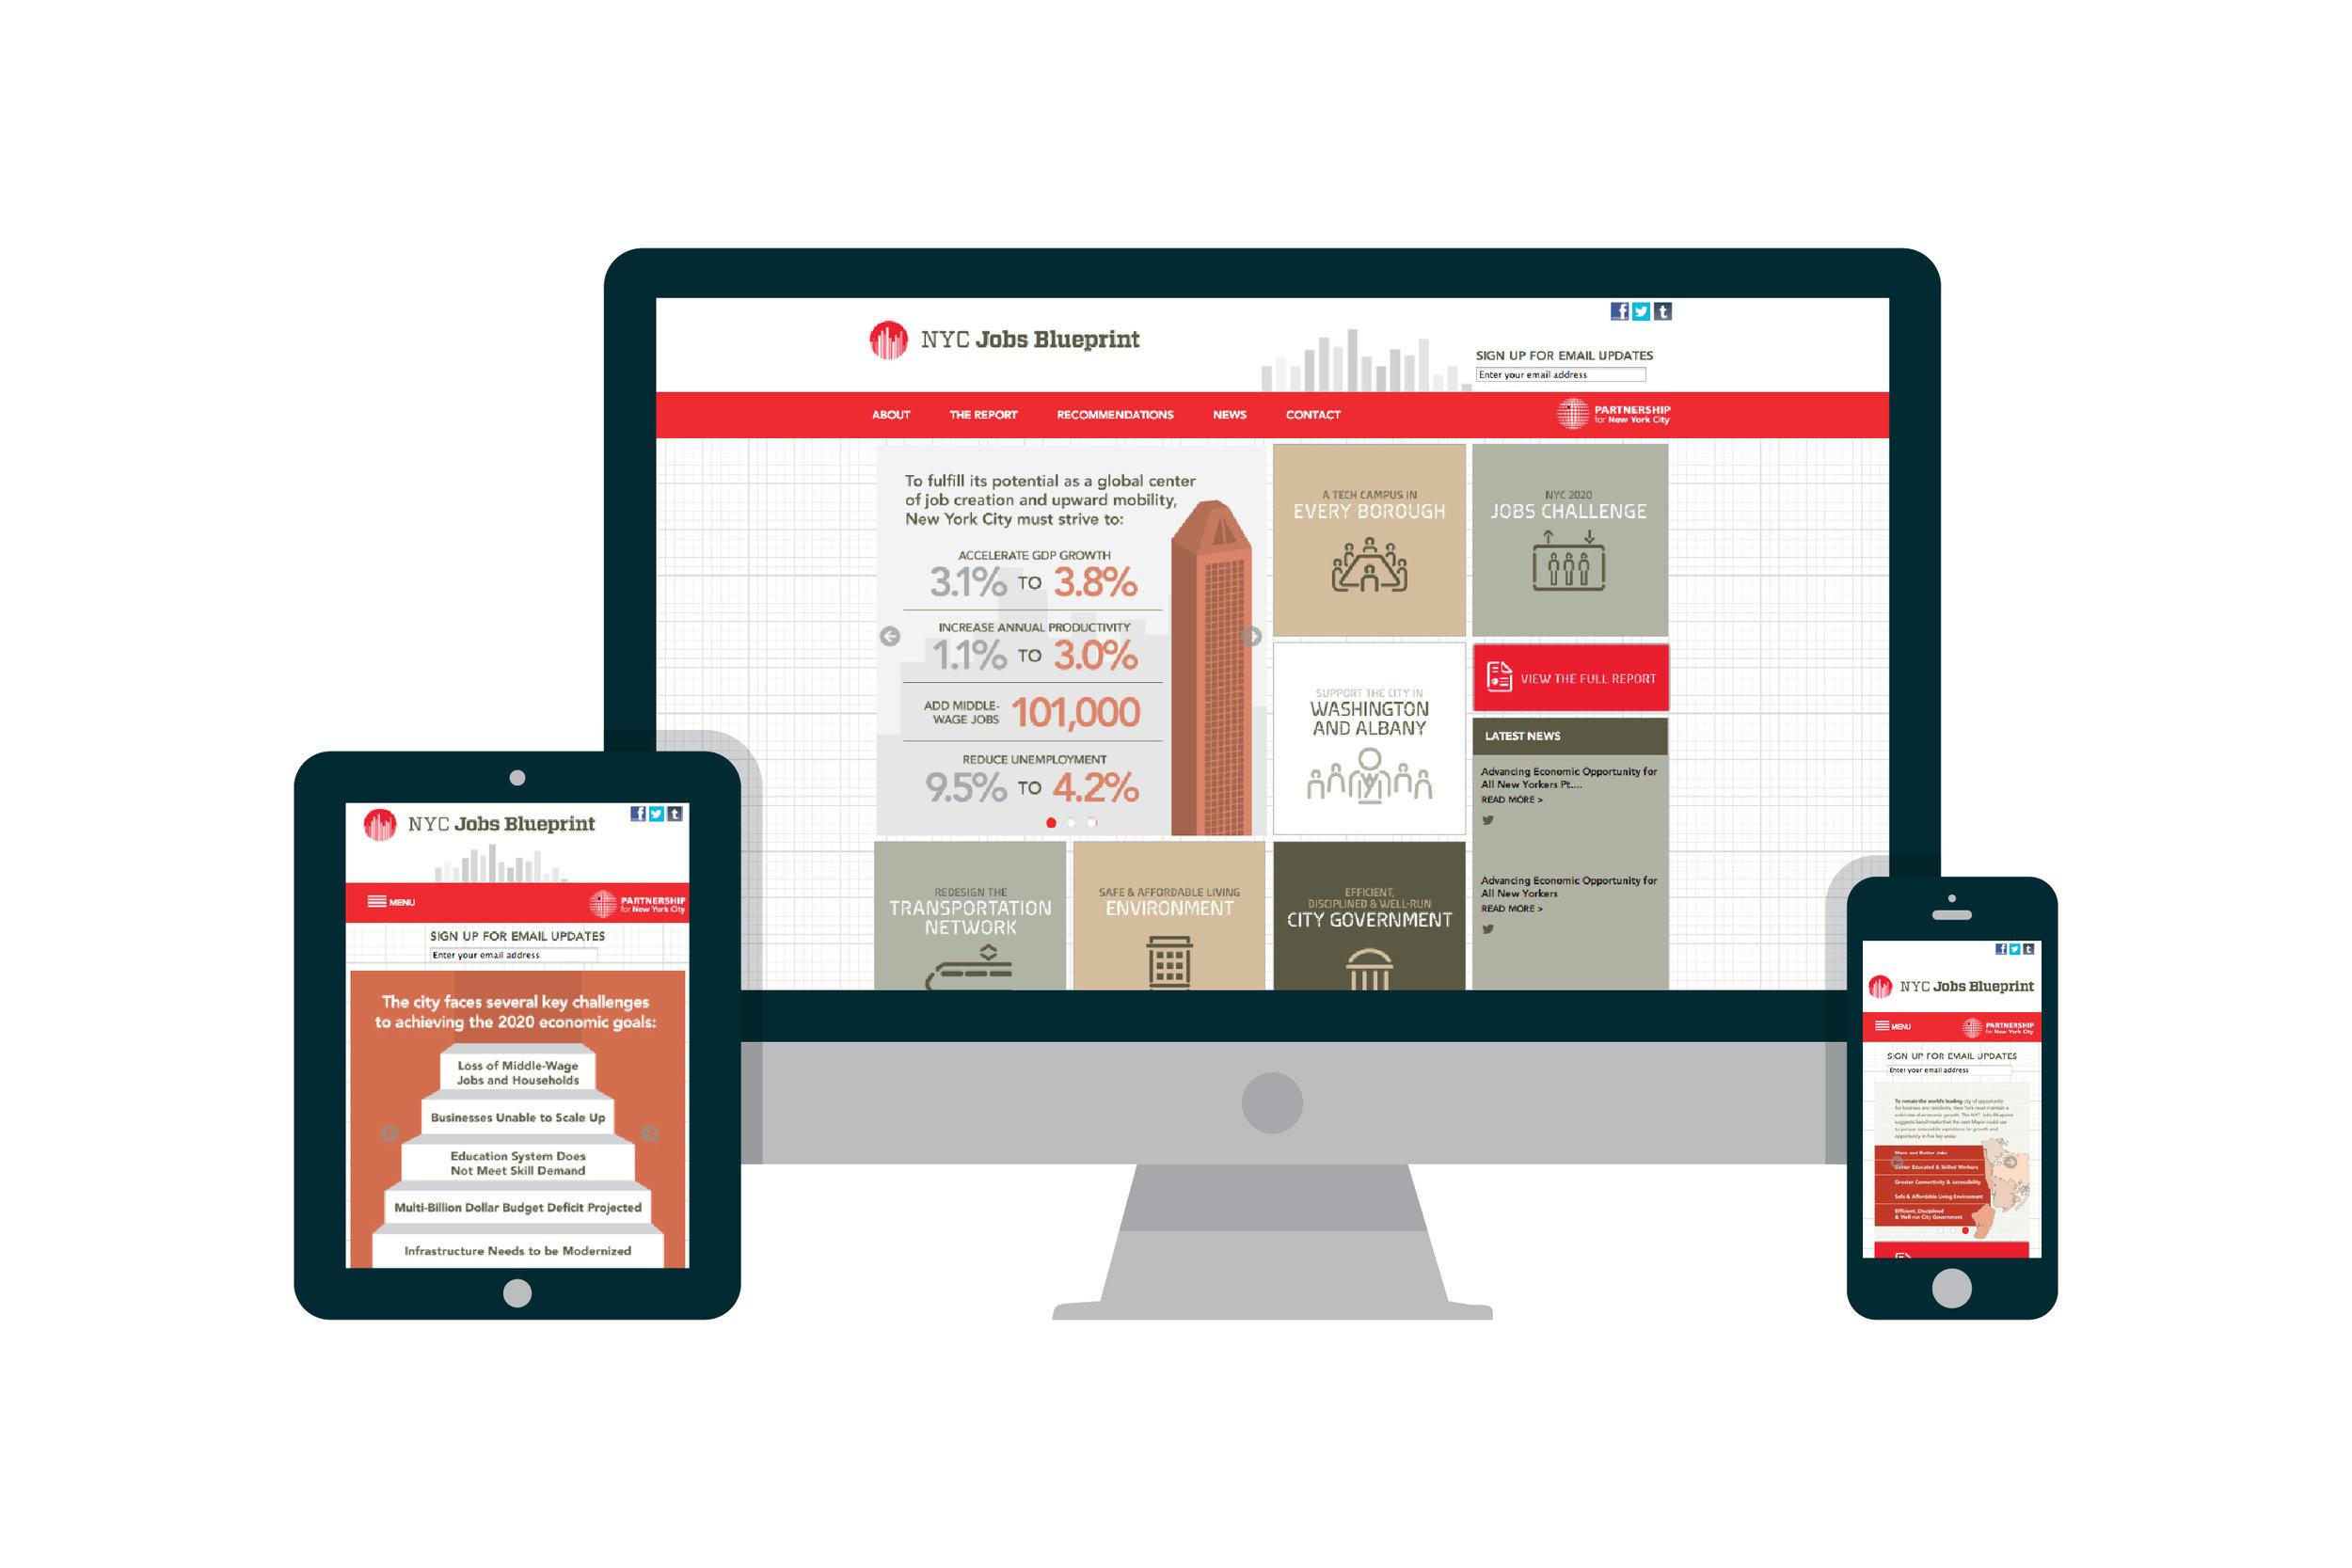 ronaldvillegas-nyc-jobs-blueprint-responsive-web-site.jpg